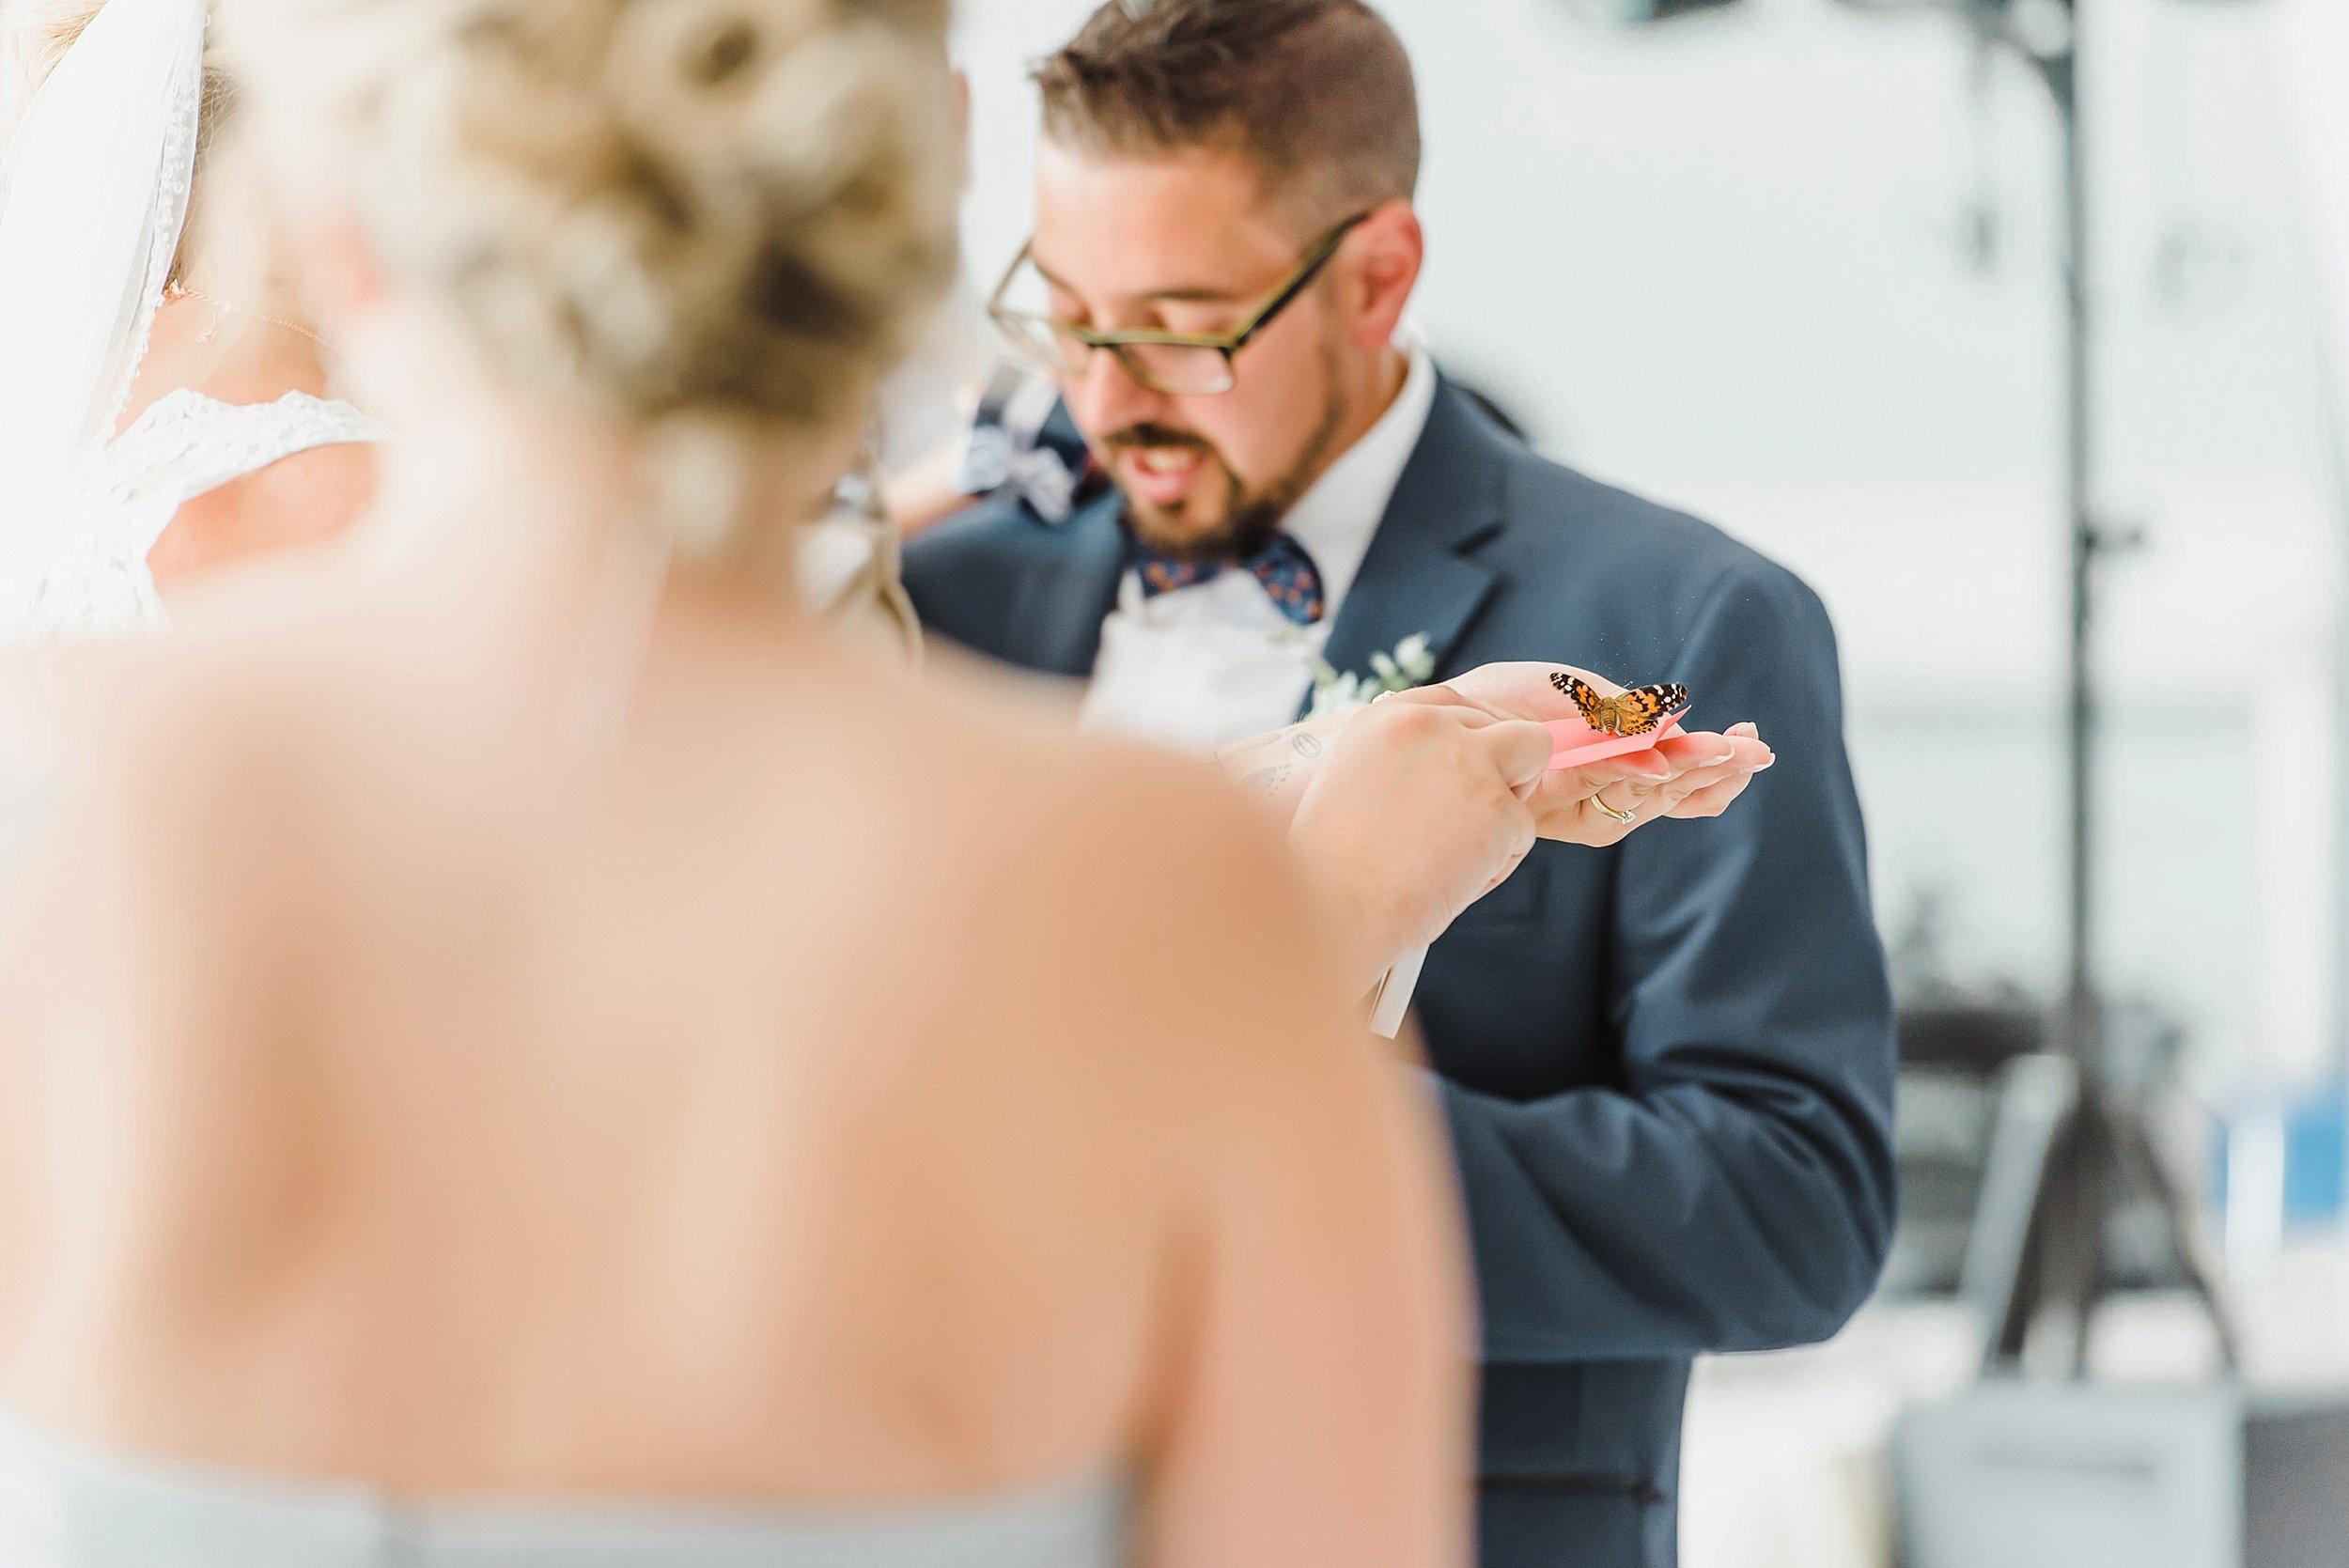 light airy indie fine art ottawa wedding photographer | Ali and Batoul Photography_0361.jpg